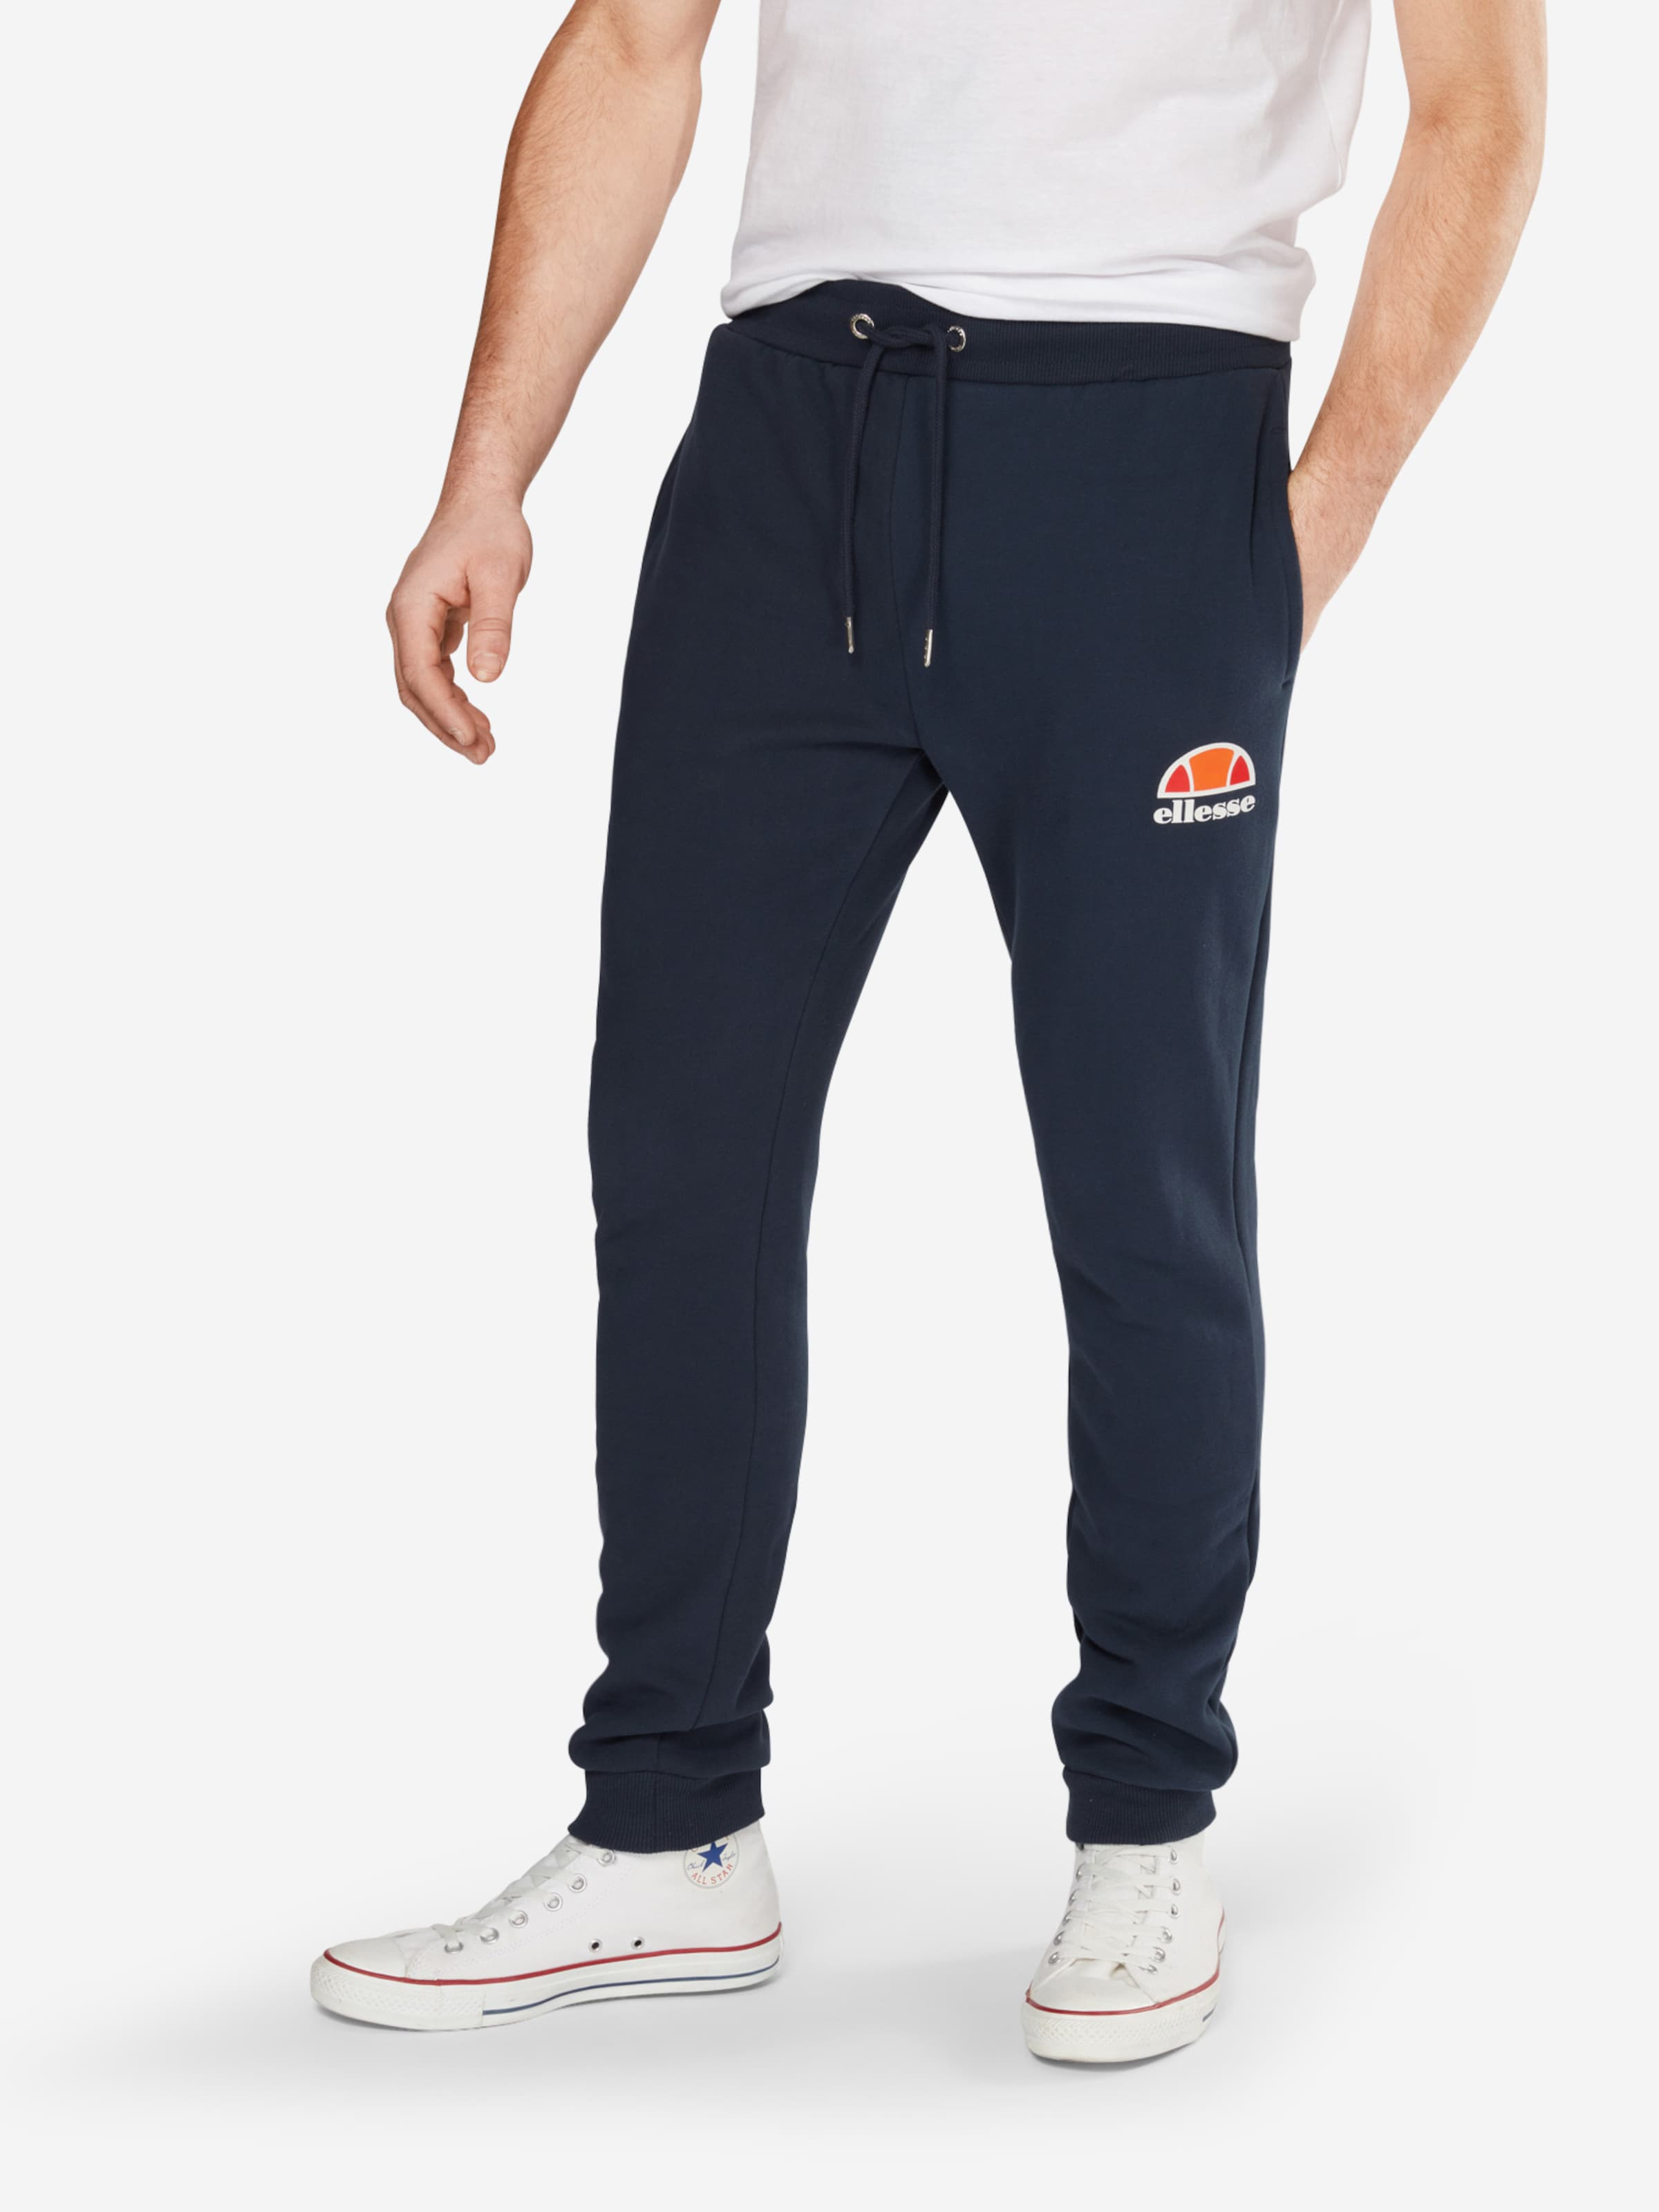 Ellesse 'ovest' En Blanc OrangeNoir Pantalon tosxQdhrCB